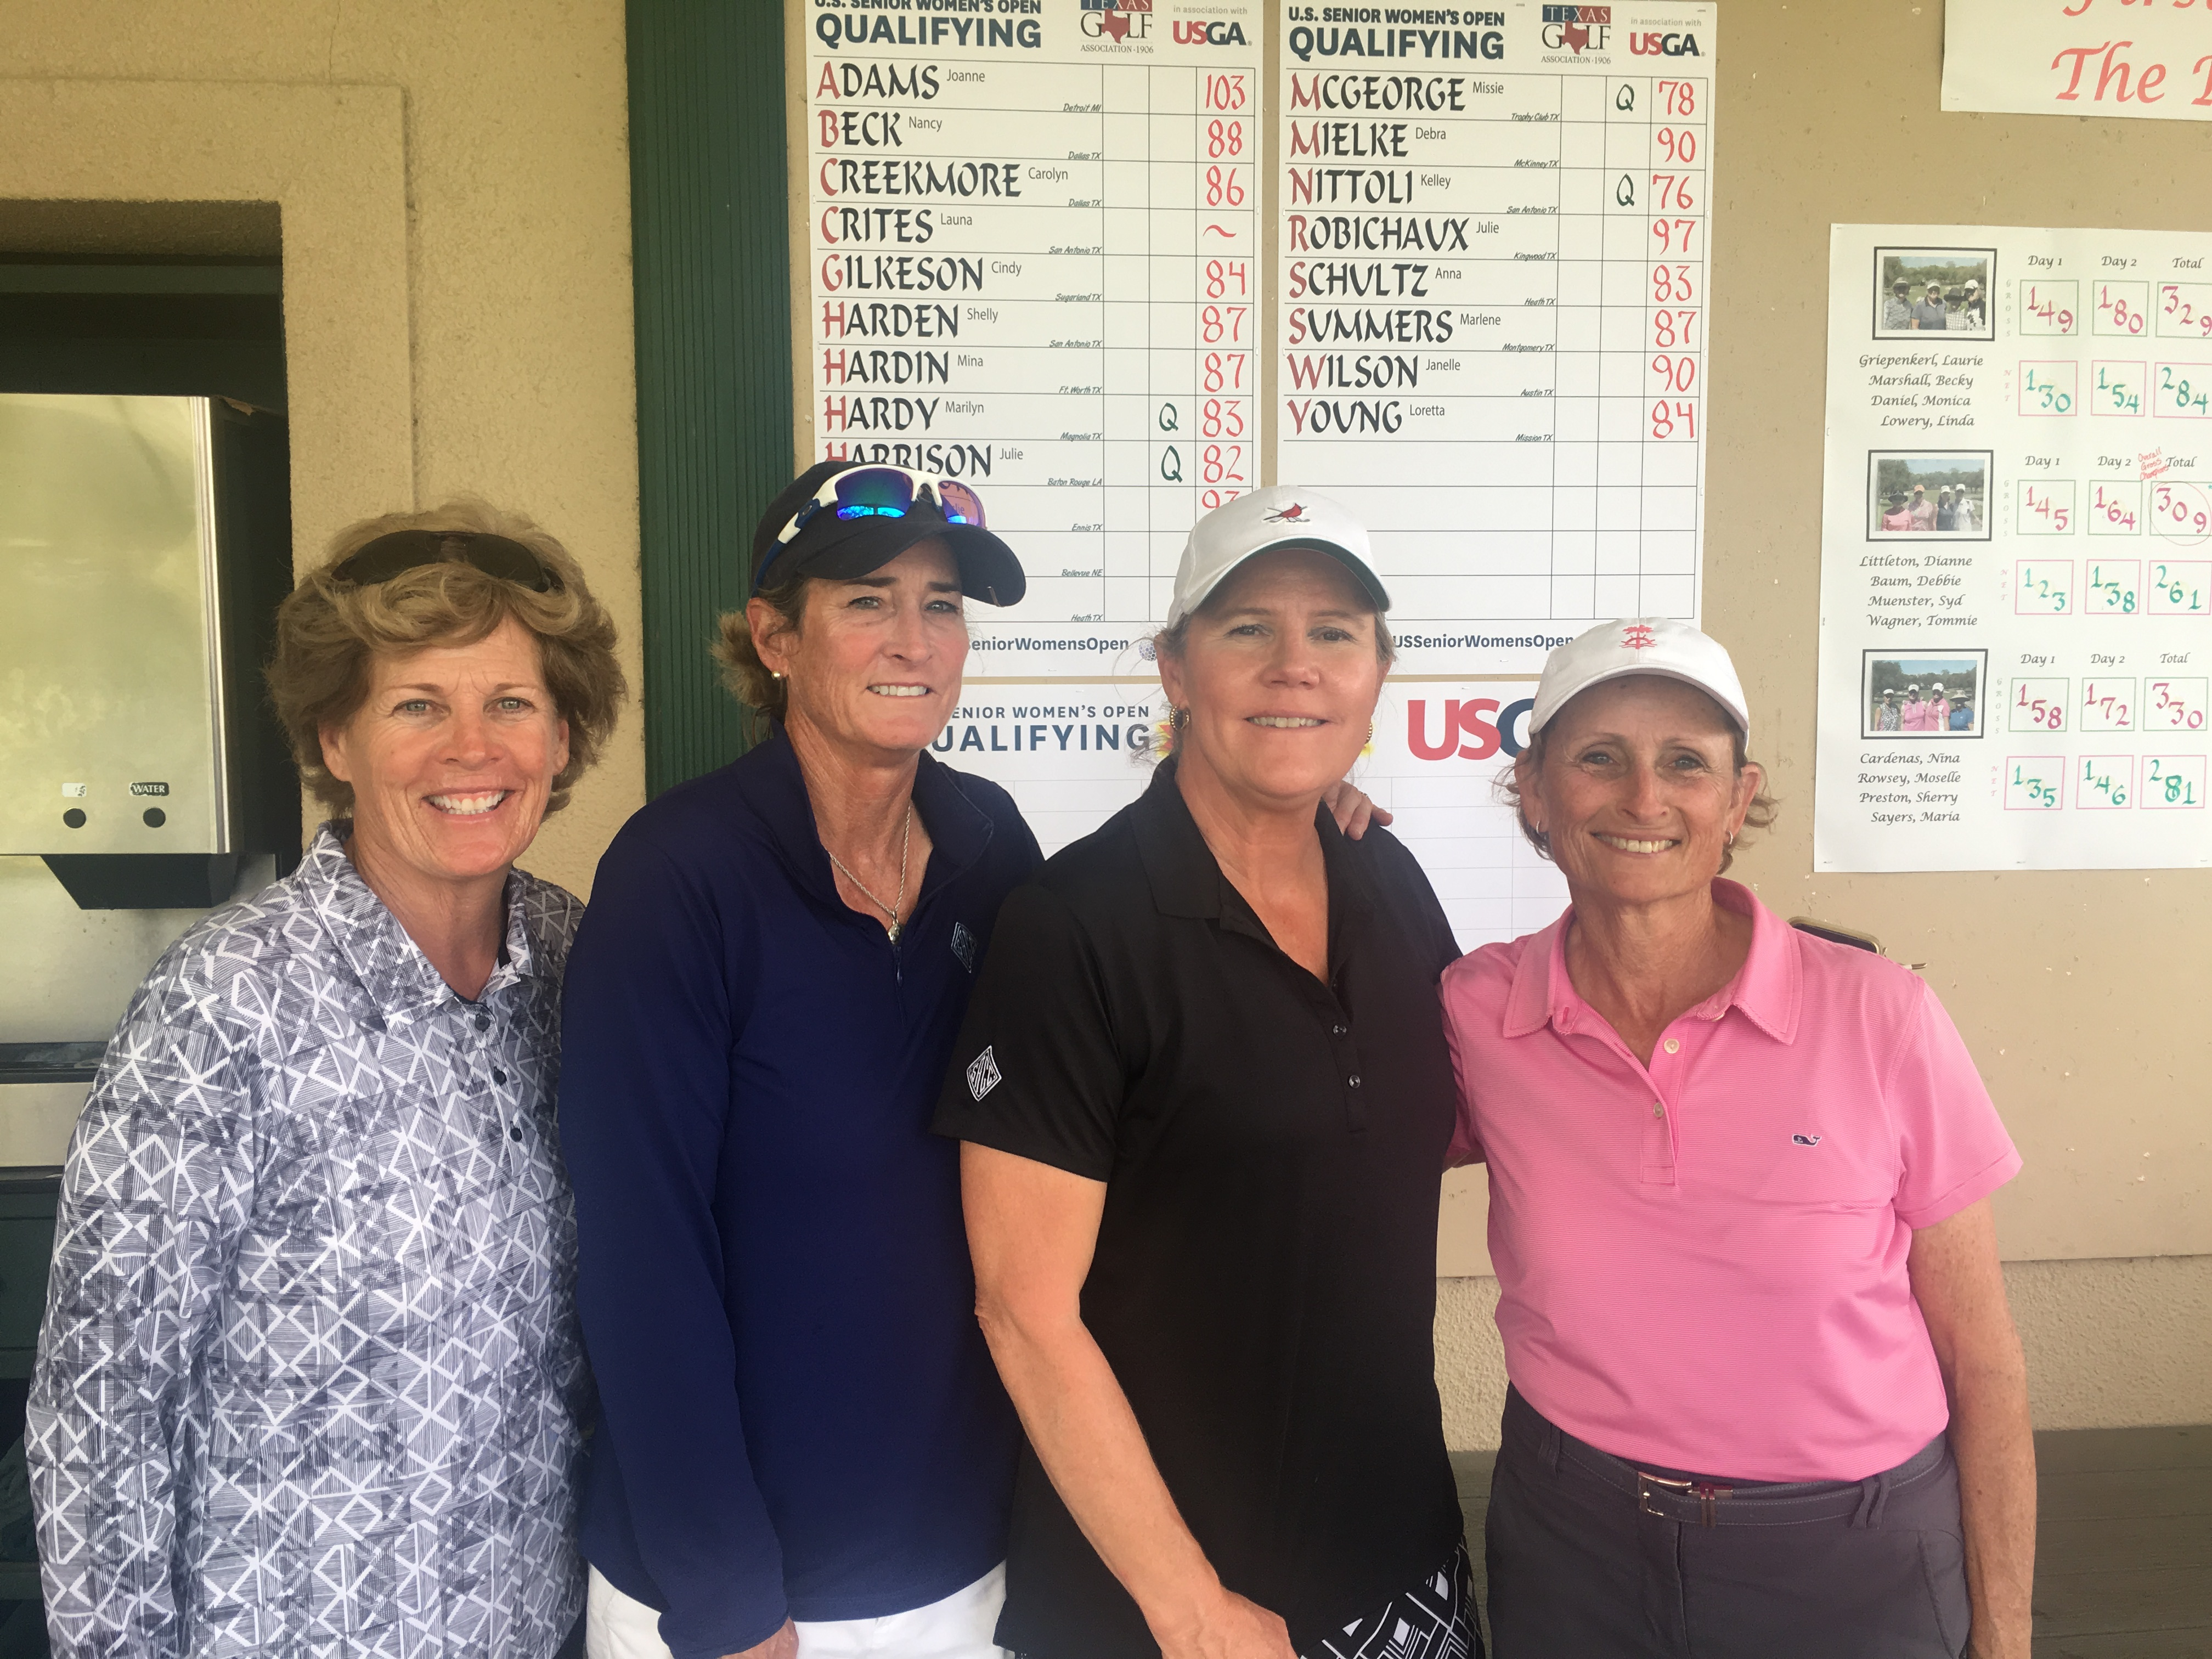 Harrison Qualifies for U.S. Senior Women's Open